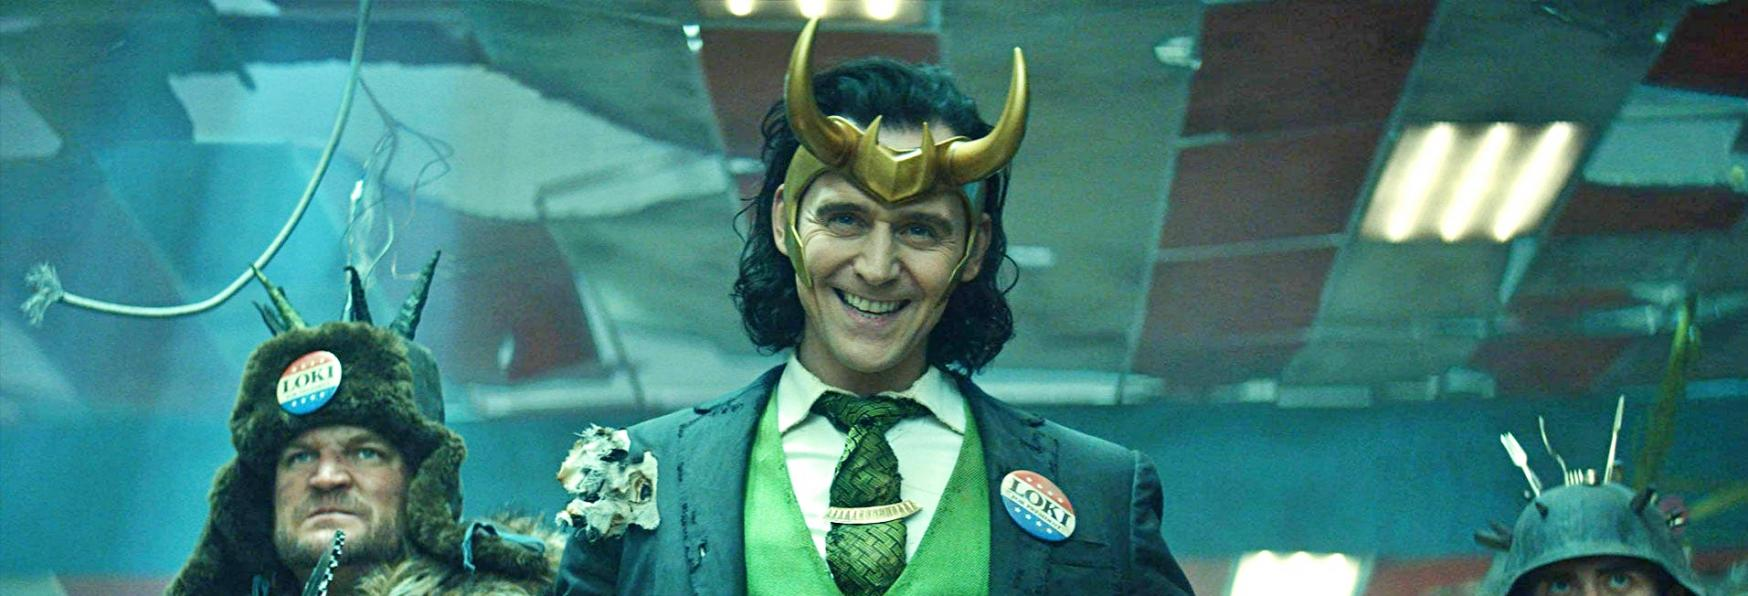 Loki 1x06: in attesa del Finale di Stagione, su Twitter impazza l'hashtag #OtherLokiVariants